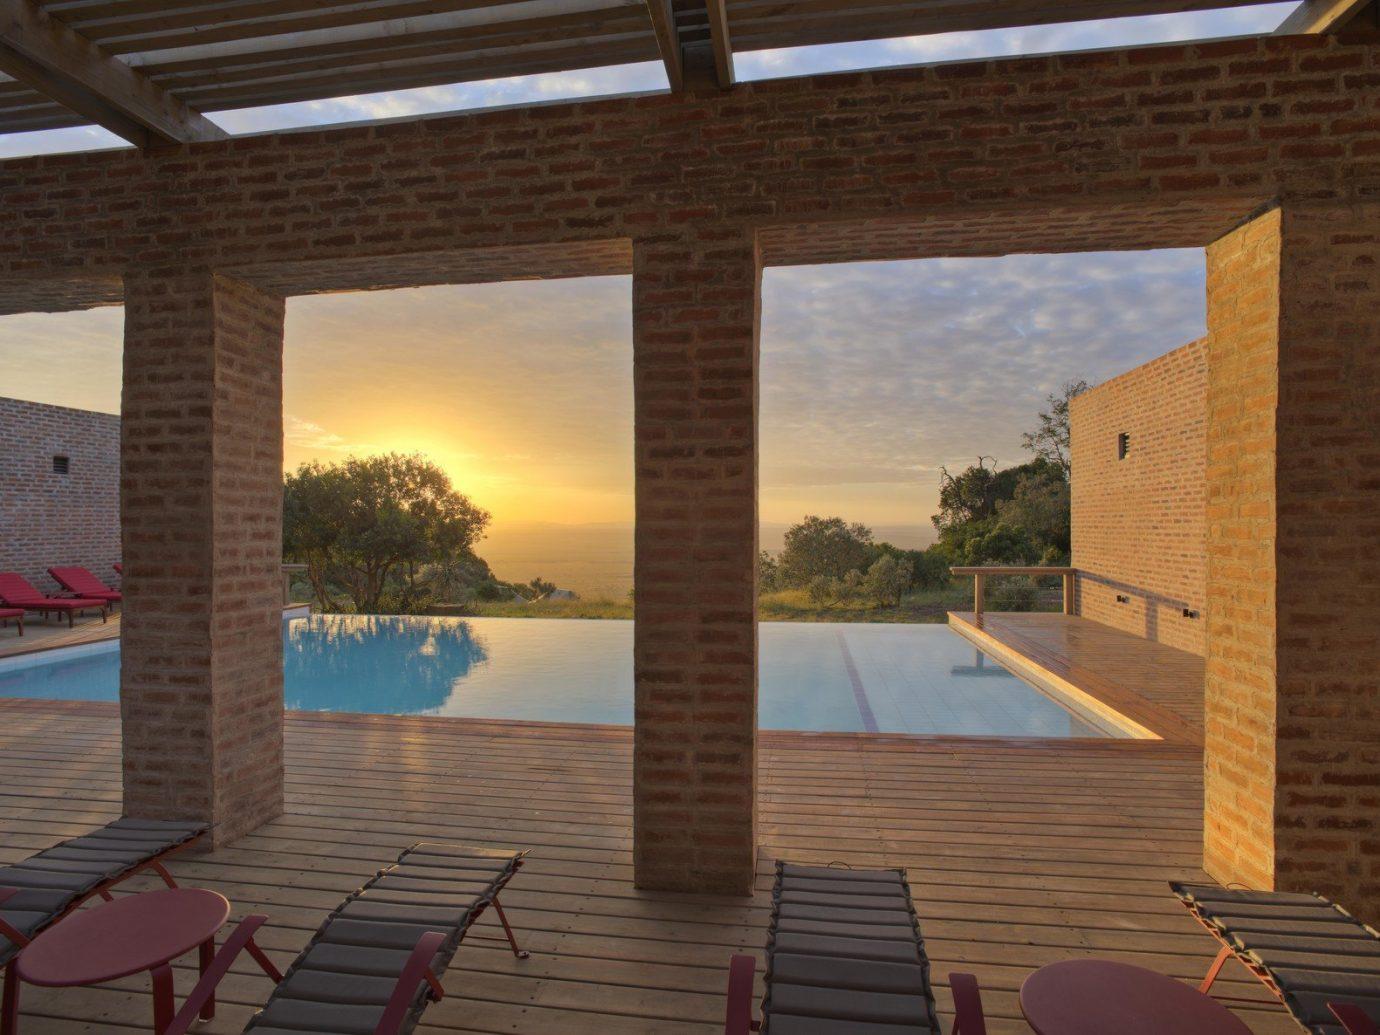 All-Inclusive Resorts Hotels Romantic Hotels property building Architecture estate swimming pool Villa Resort interior design hacienda outdoor structure cottage